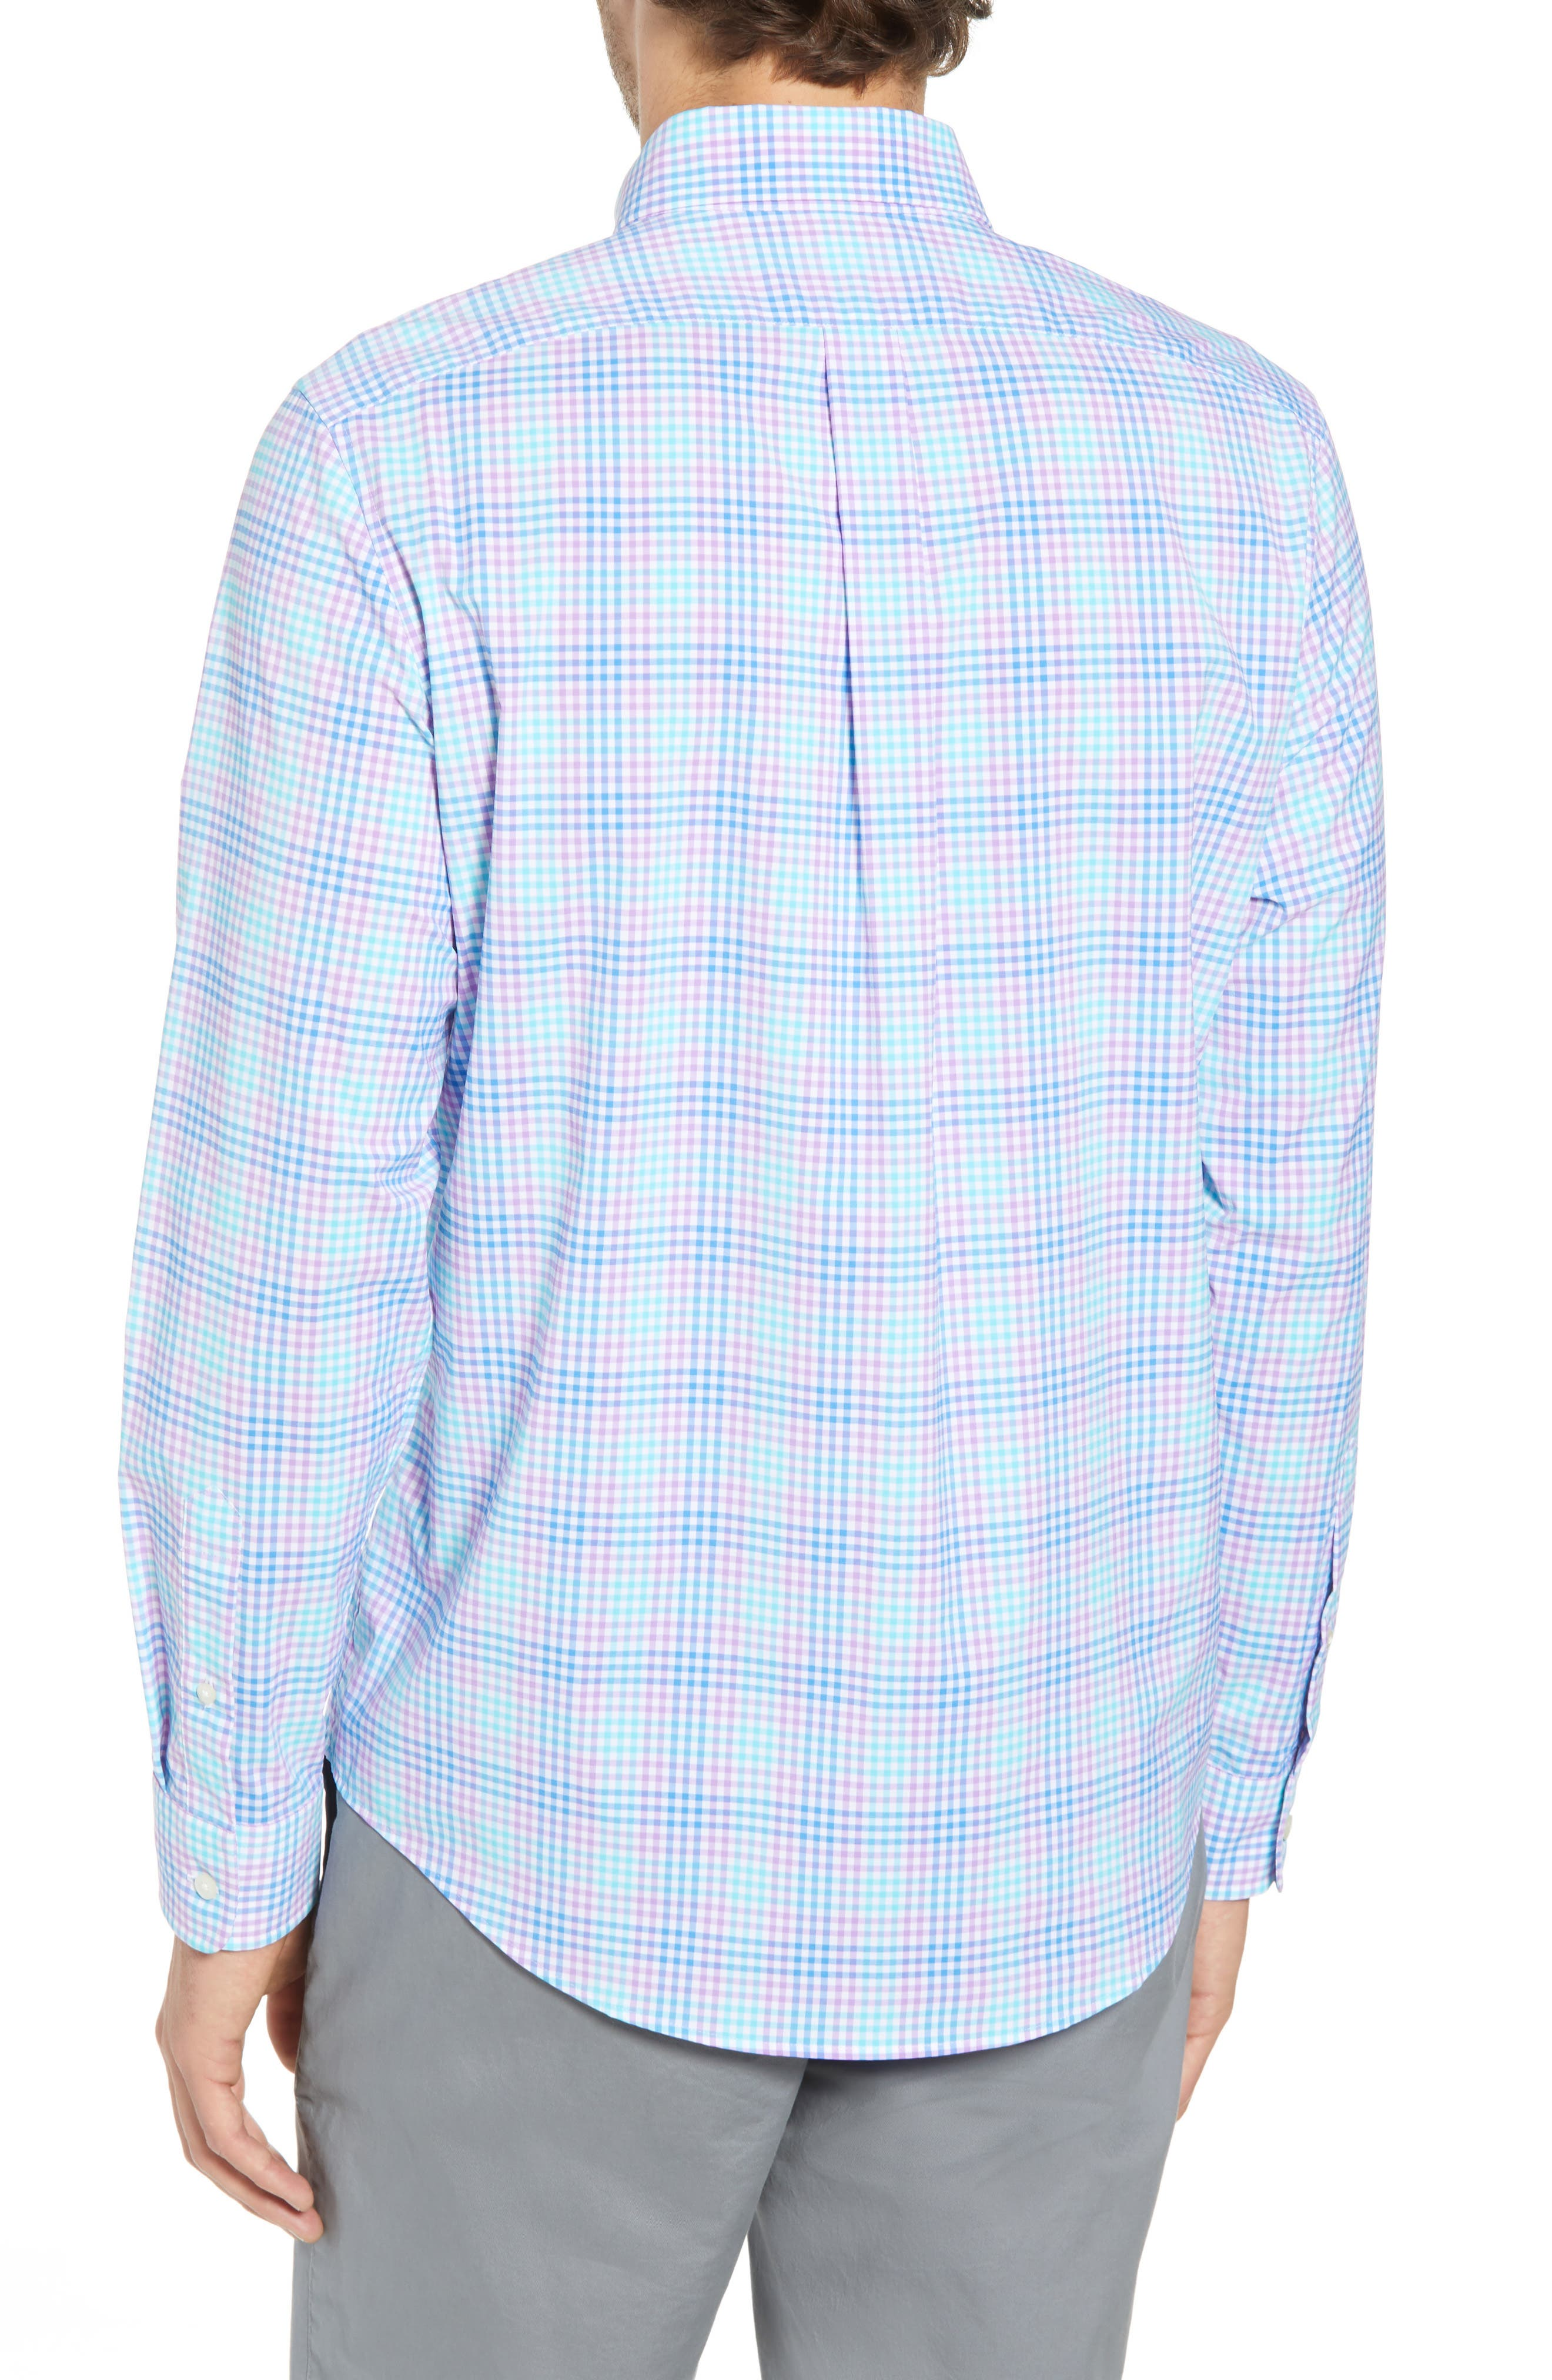 Ridge Hill Slim Fit Check Performance Sport Shirt,                             Alternate thumbnail 3, color,                             Turquoise